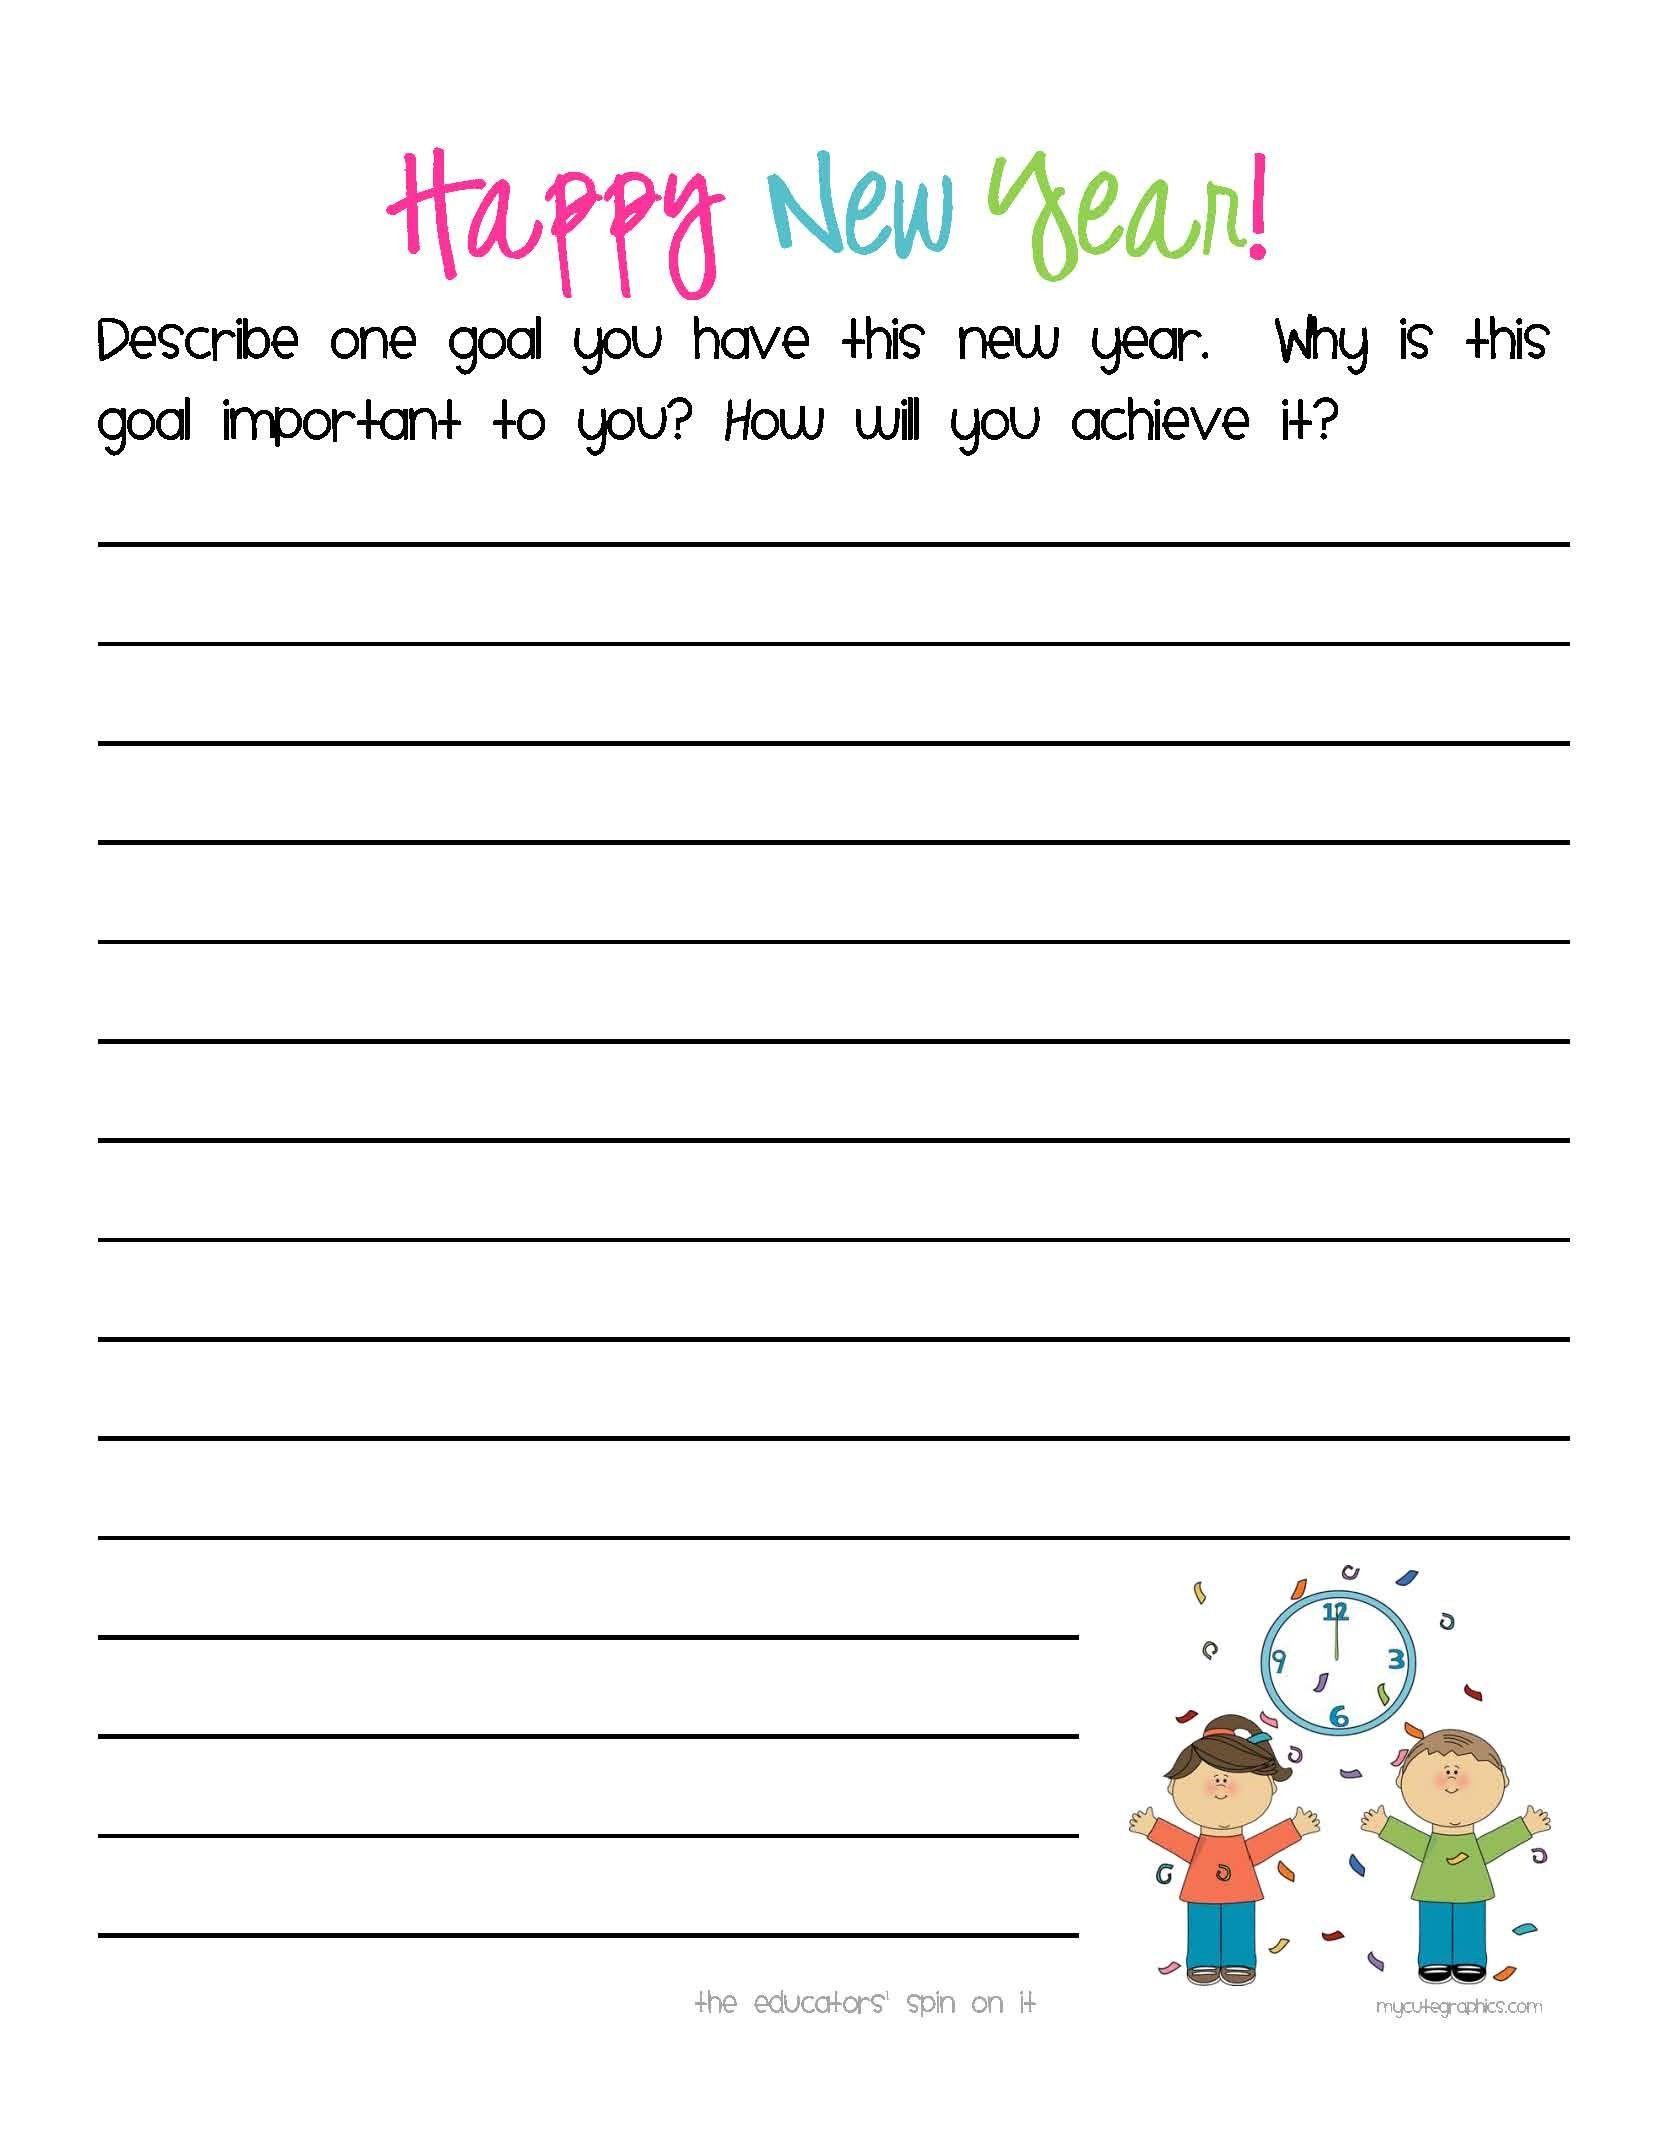 small resolution of 4th Grade Essay Writing Worksheets 6 4th Grade Essay Writing Worksheets  Worksheets   Creative writing worksheets